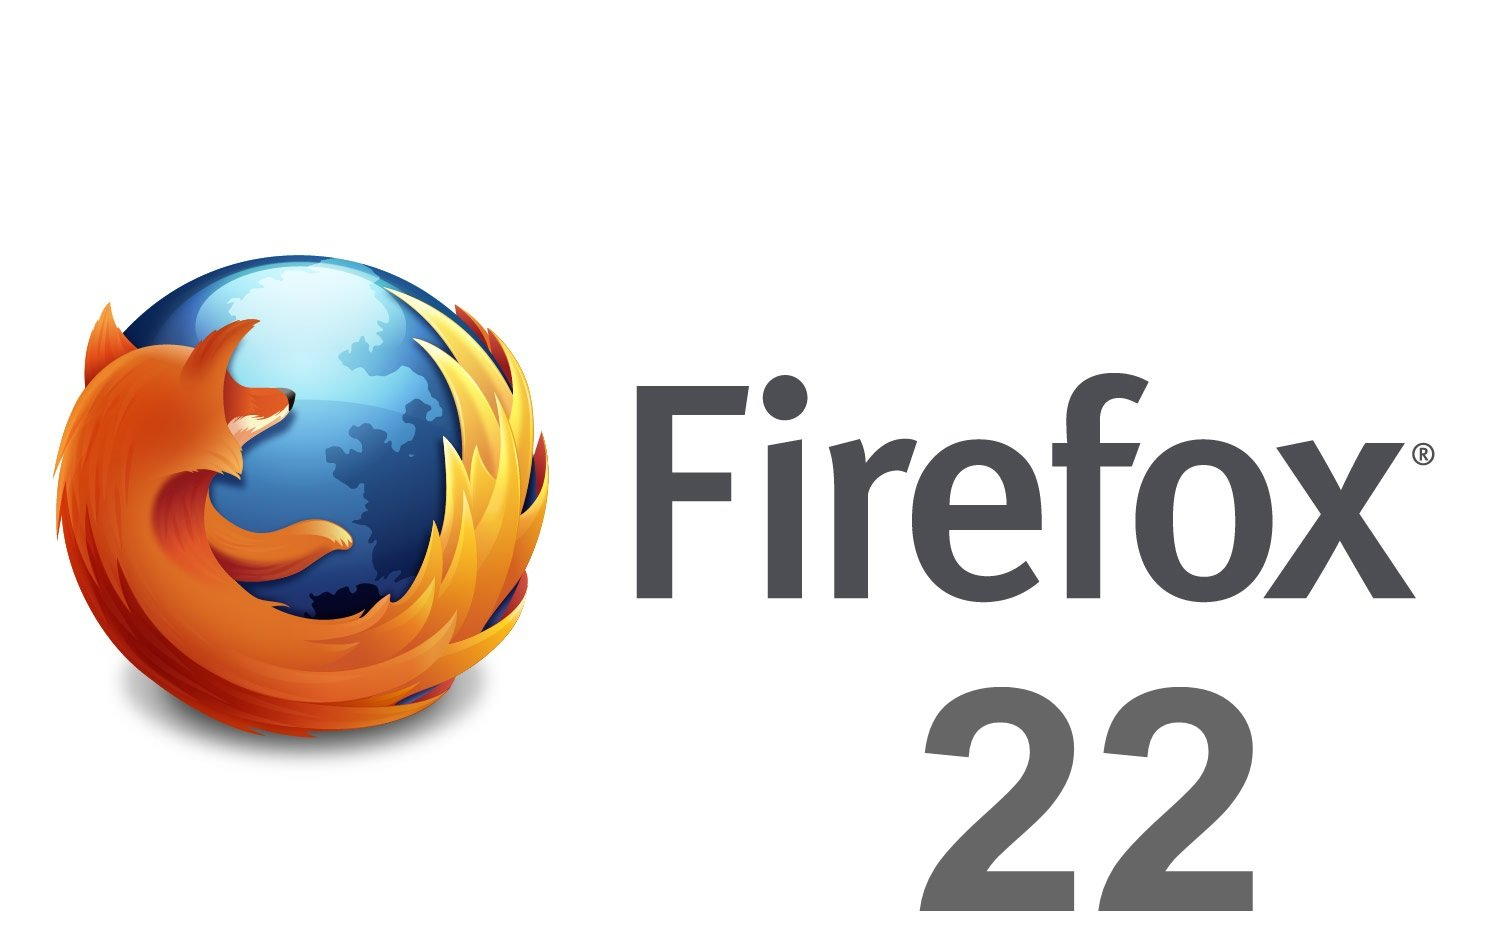 firefox_logo-wordmark-horiz_rgb1